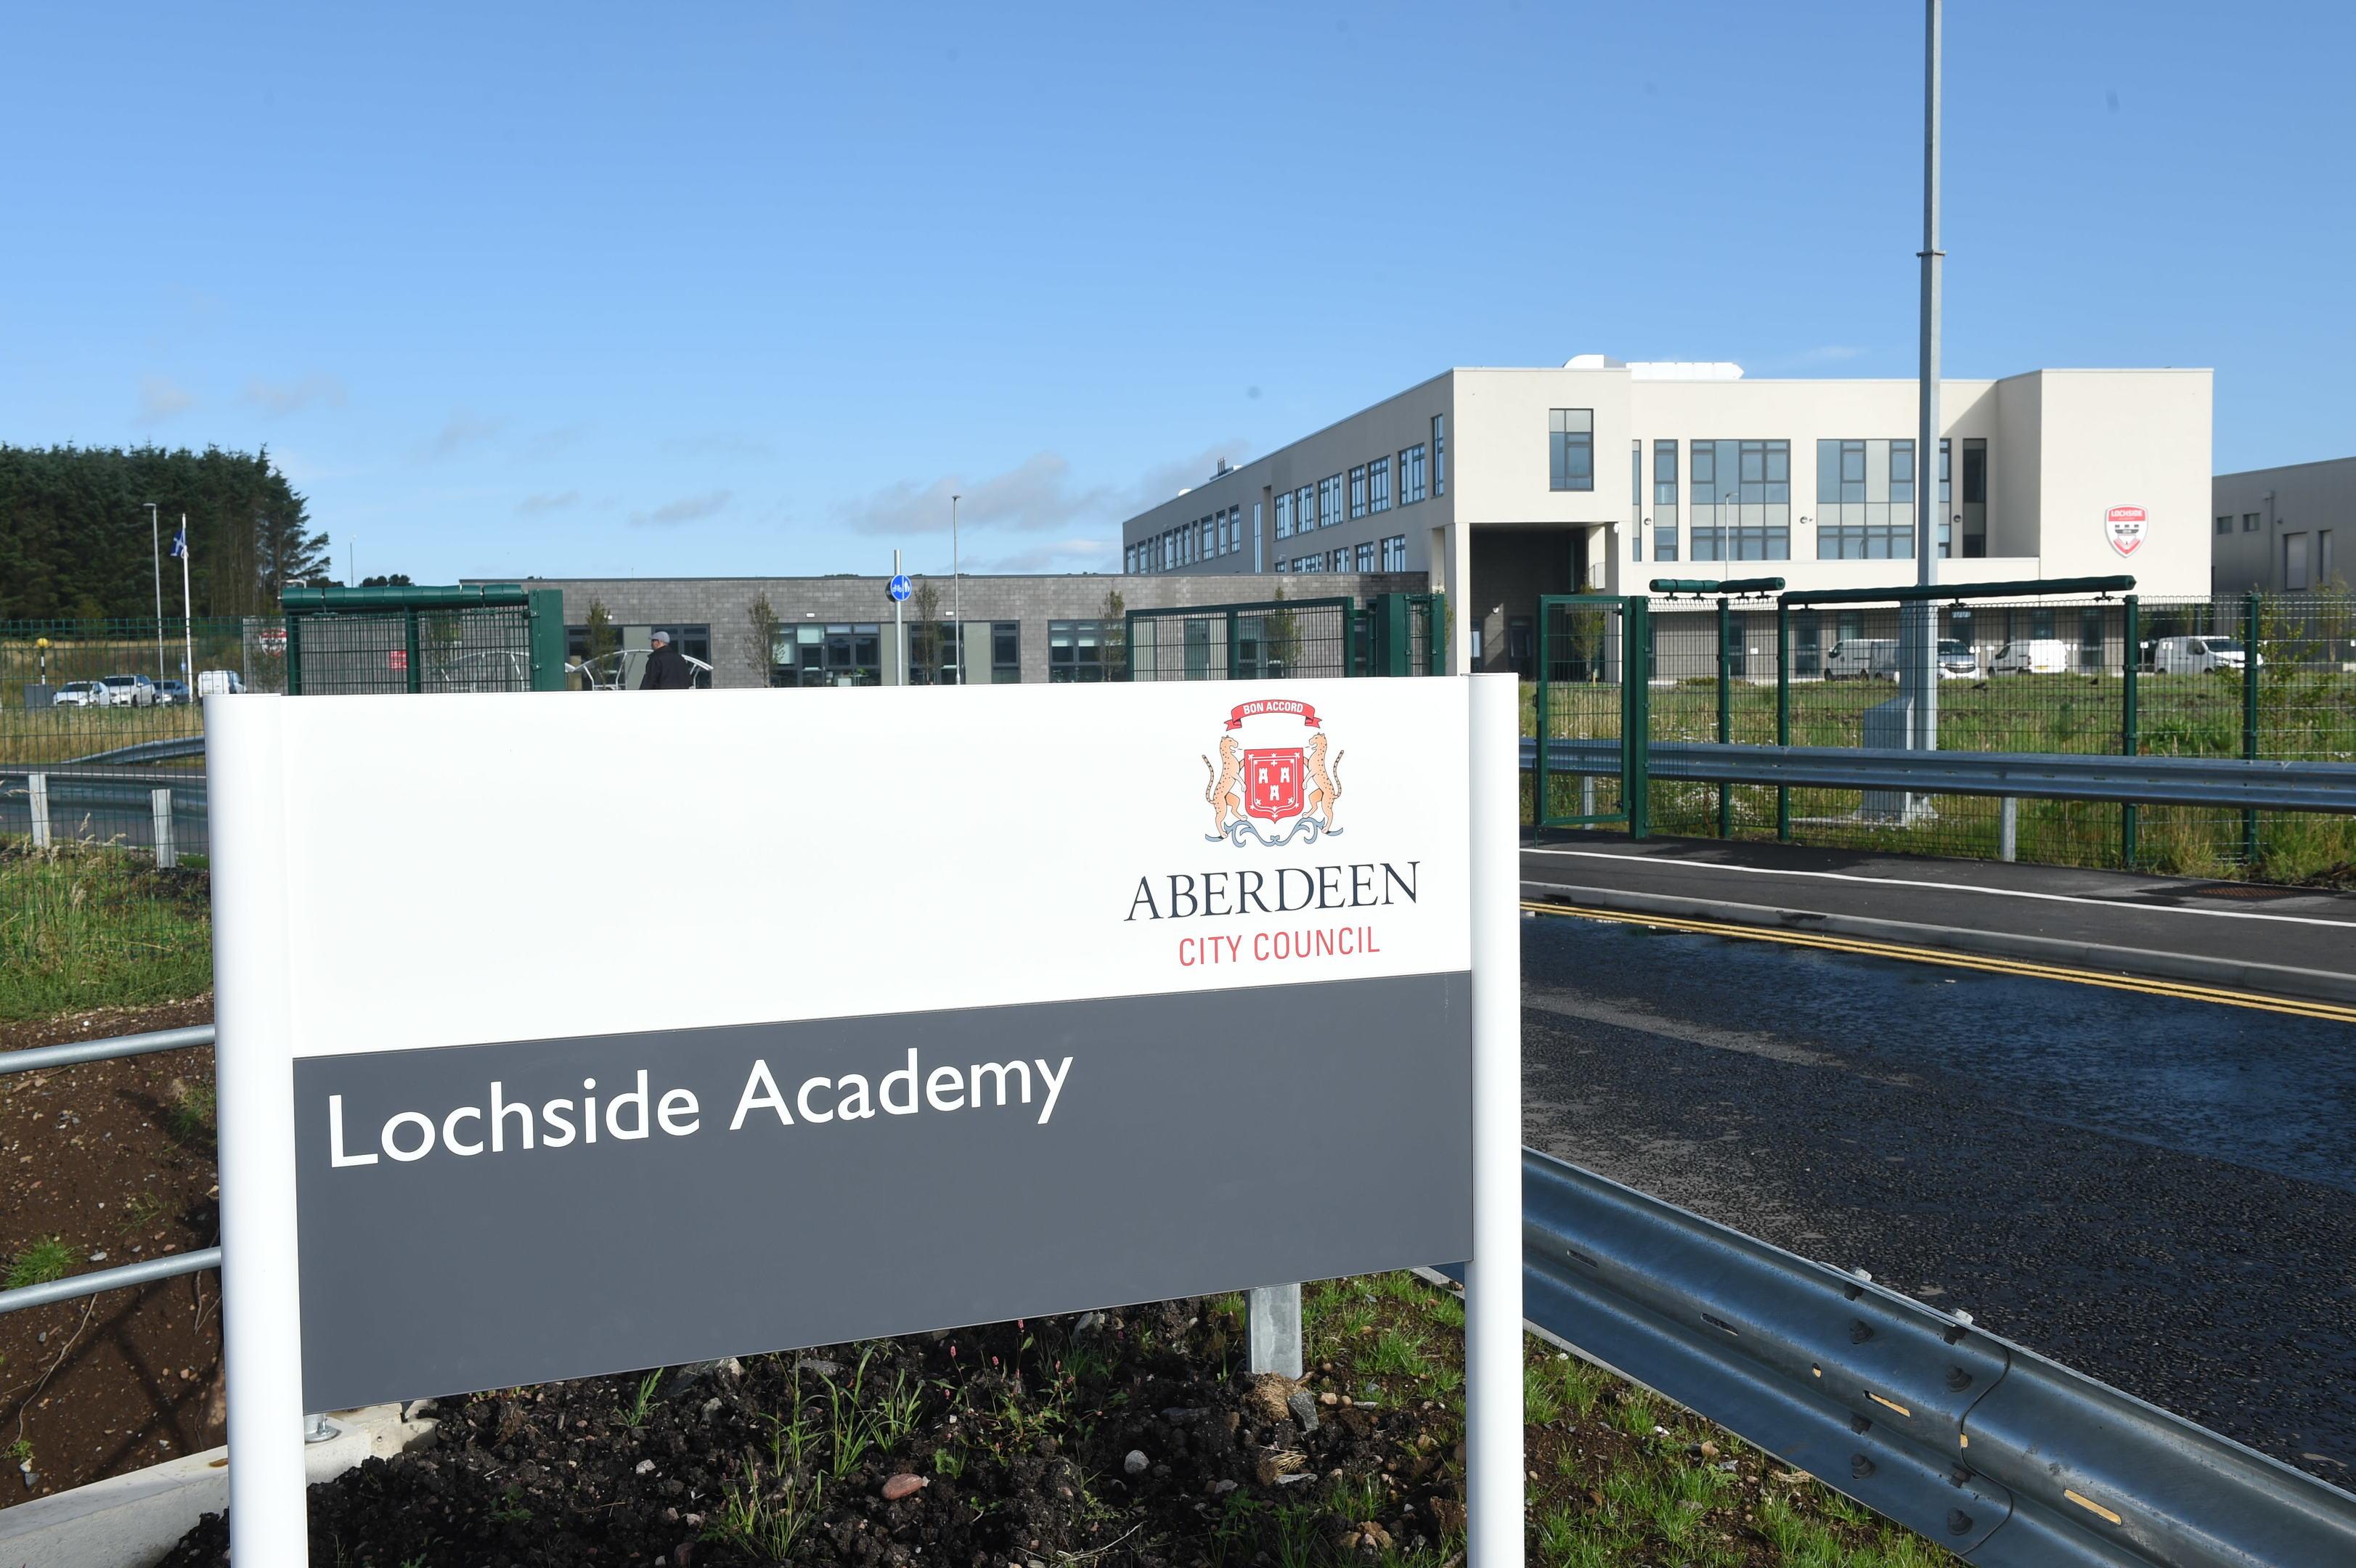 Lochside Academy